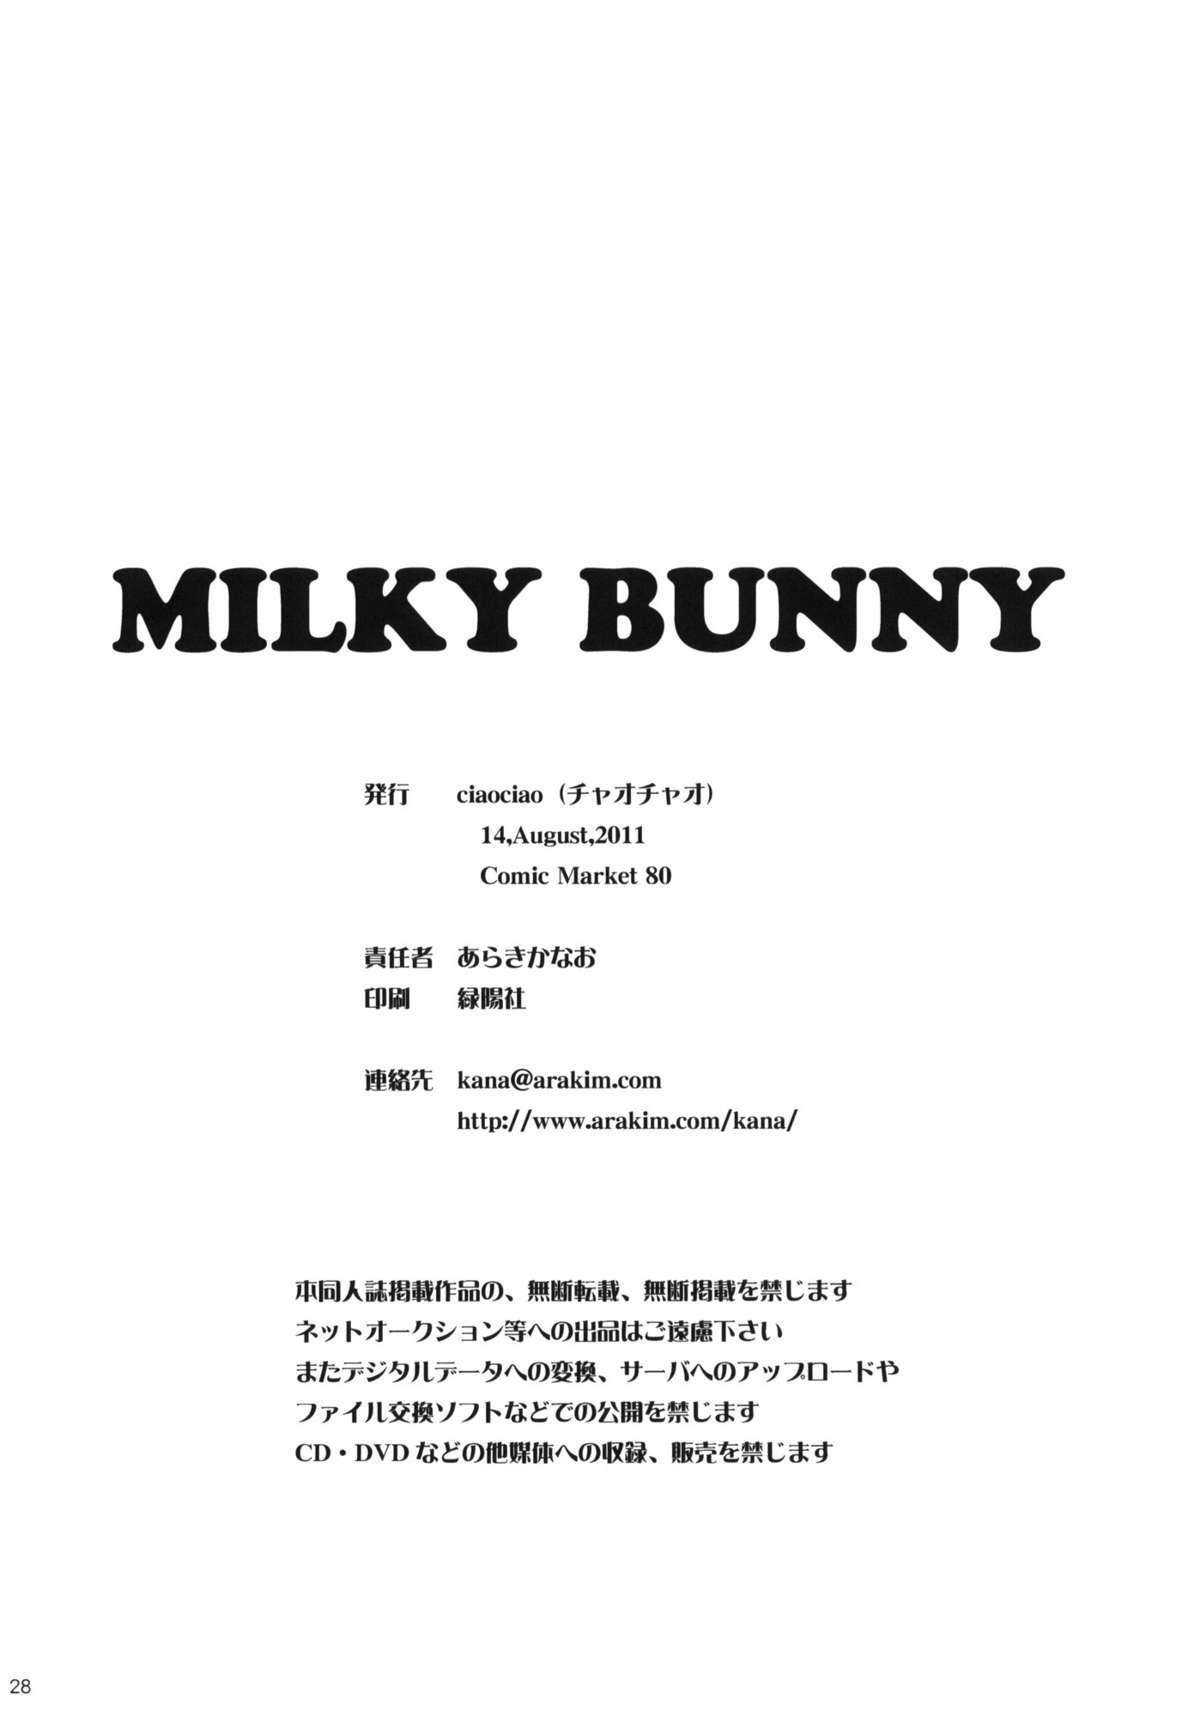 MILKY BUNNY 26